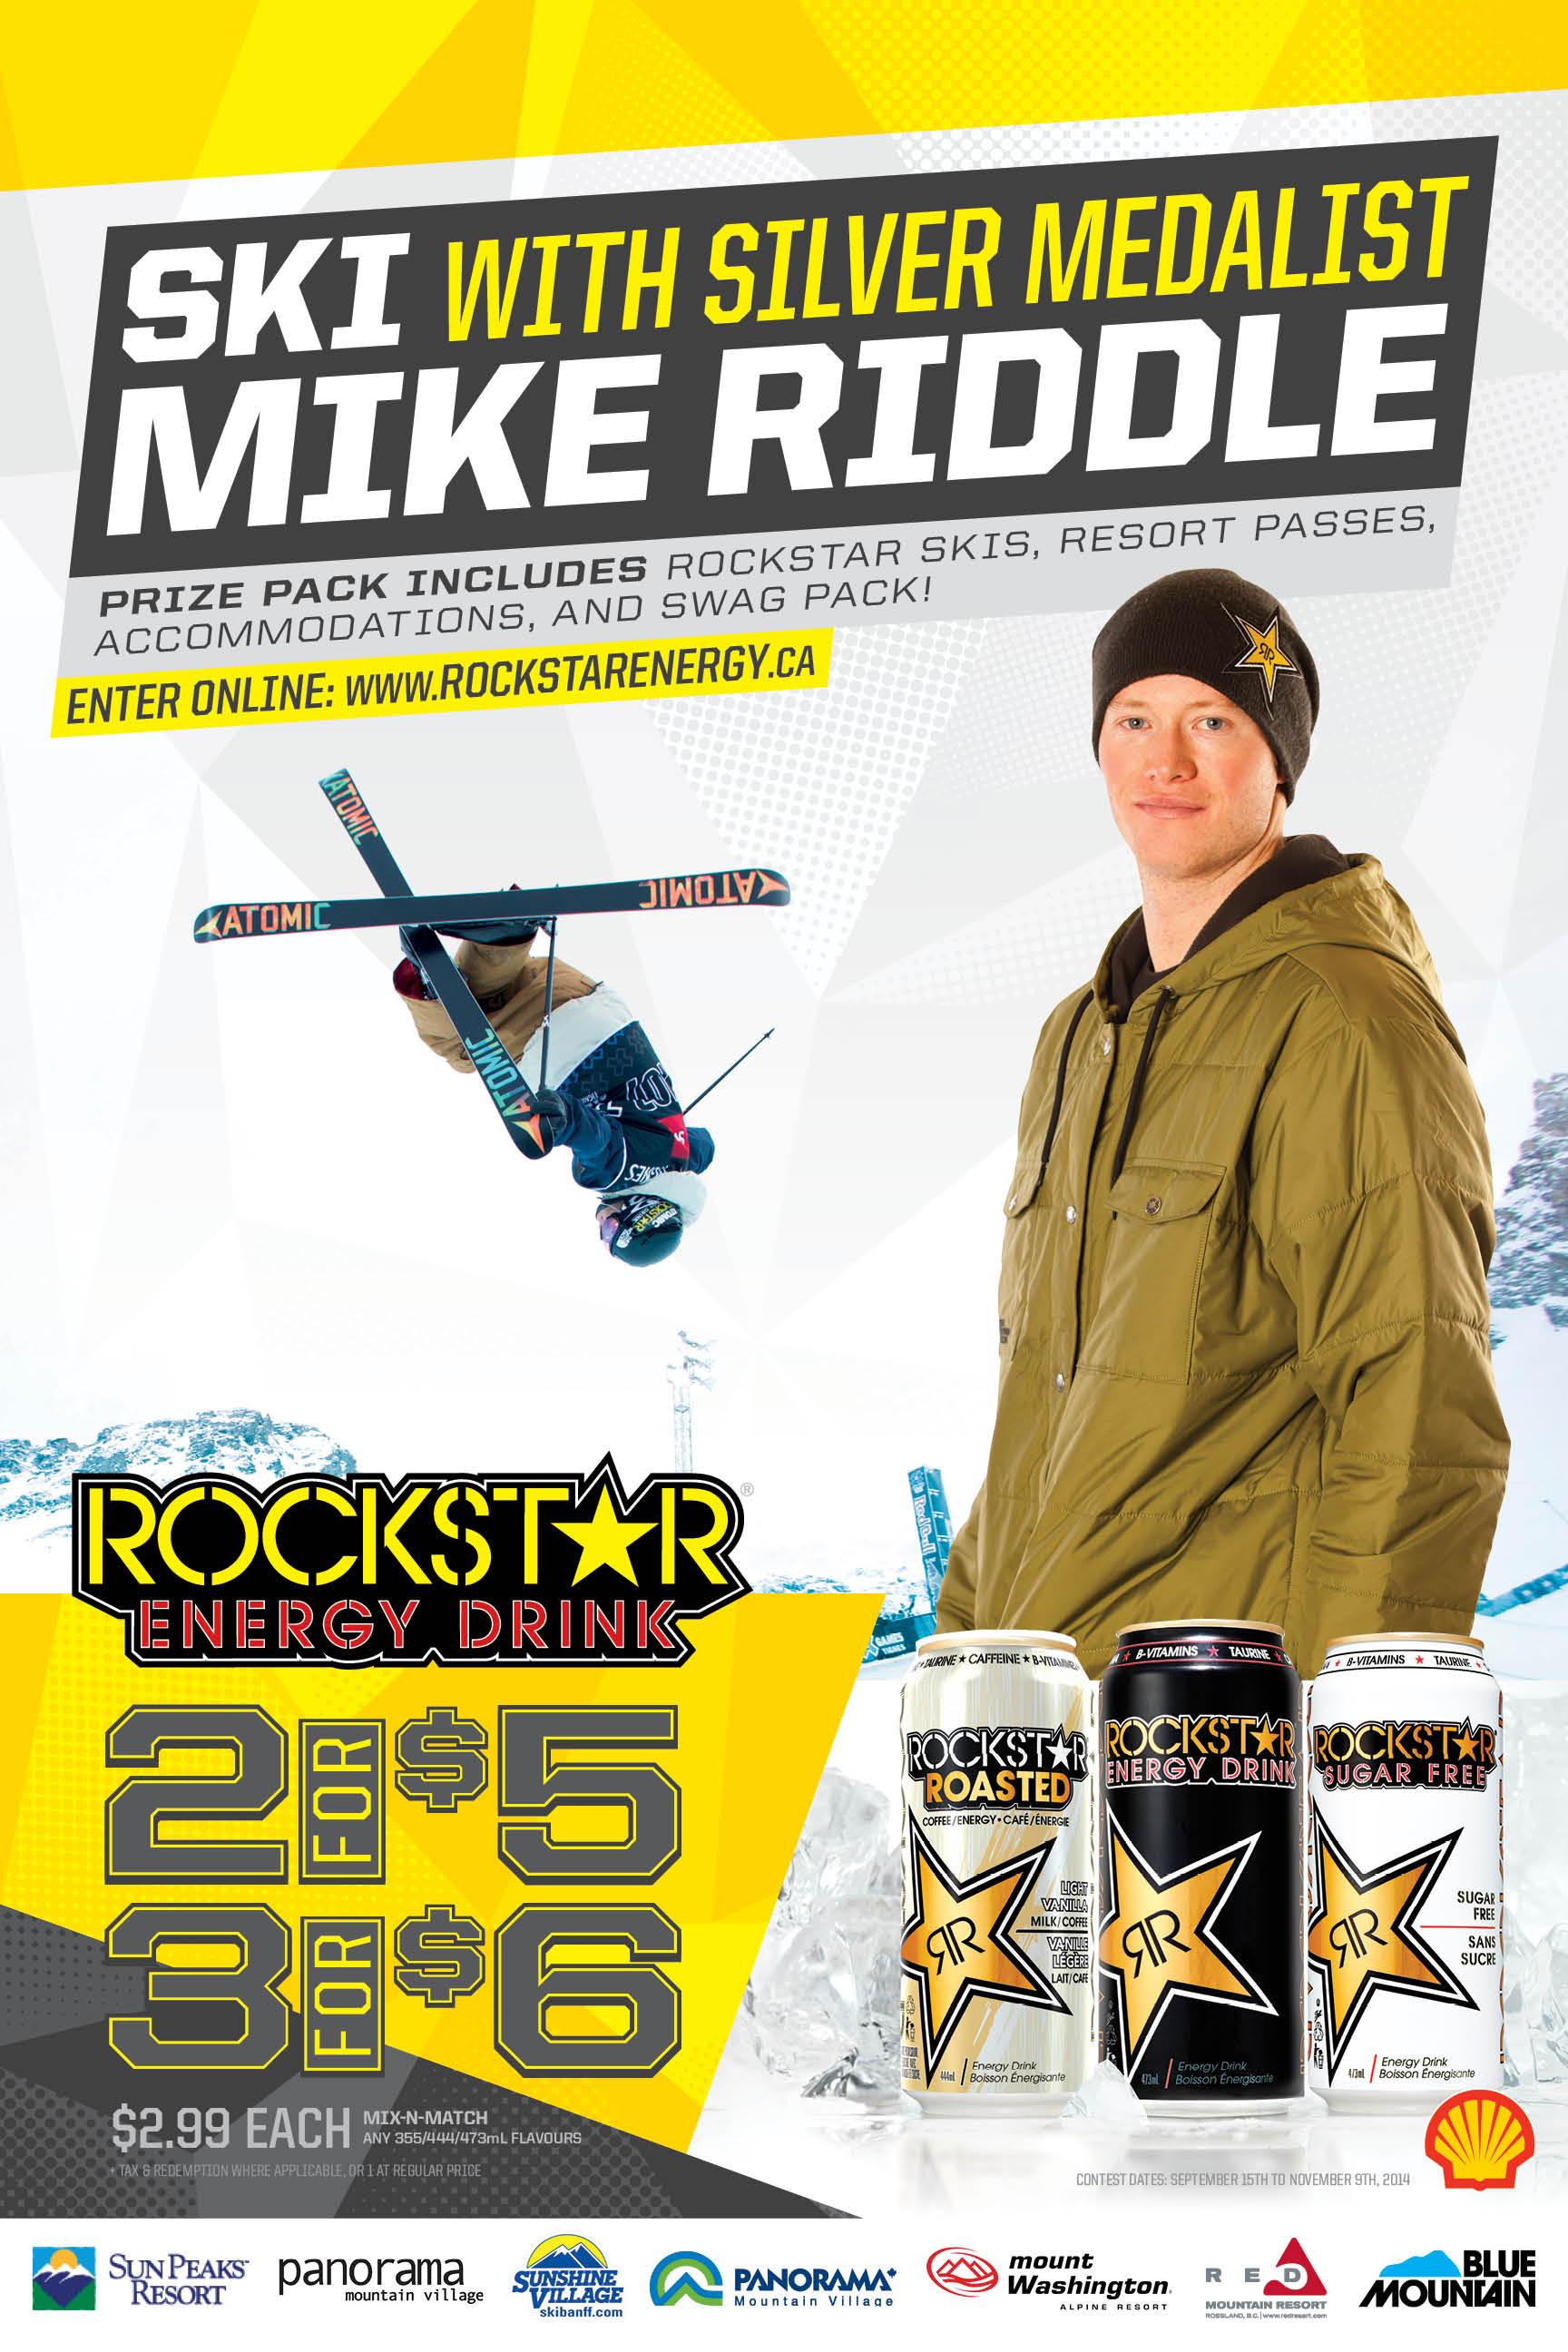 Mike Riddle / Rockstar